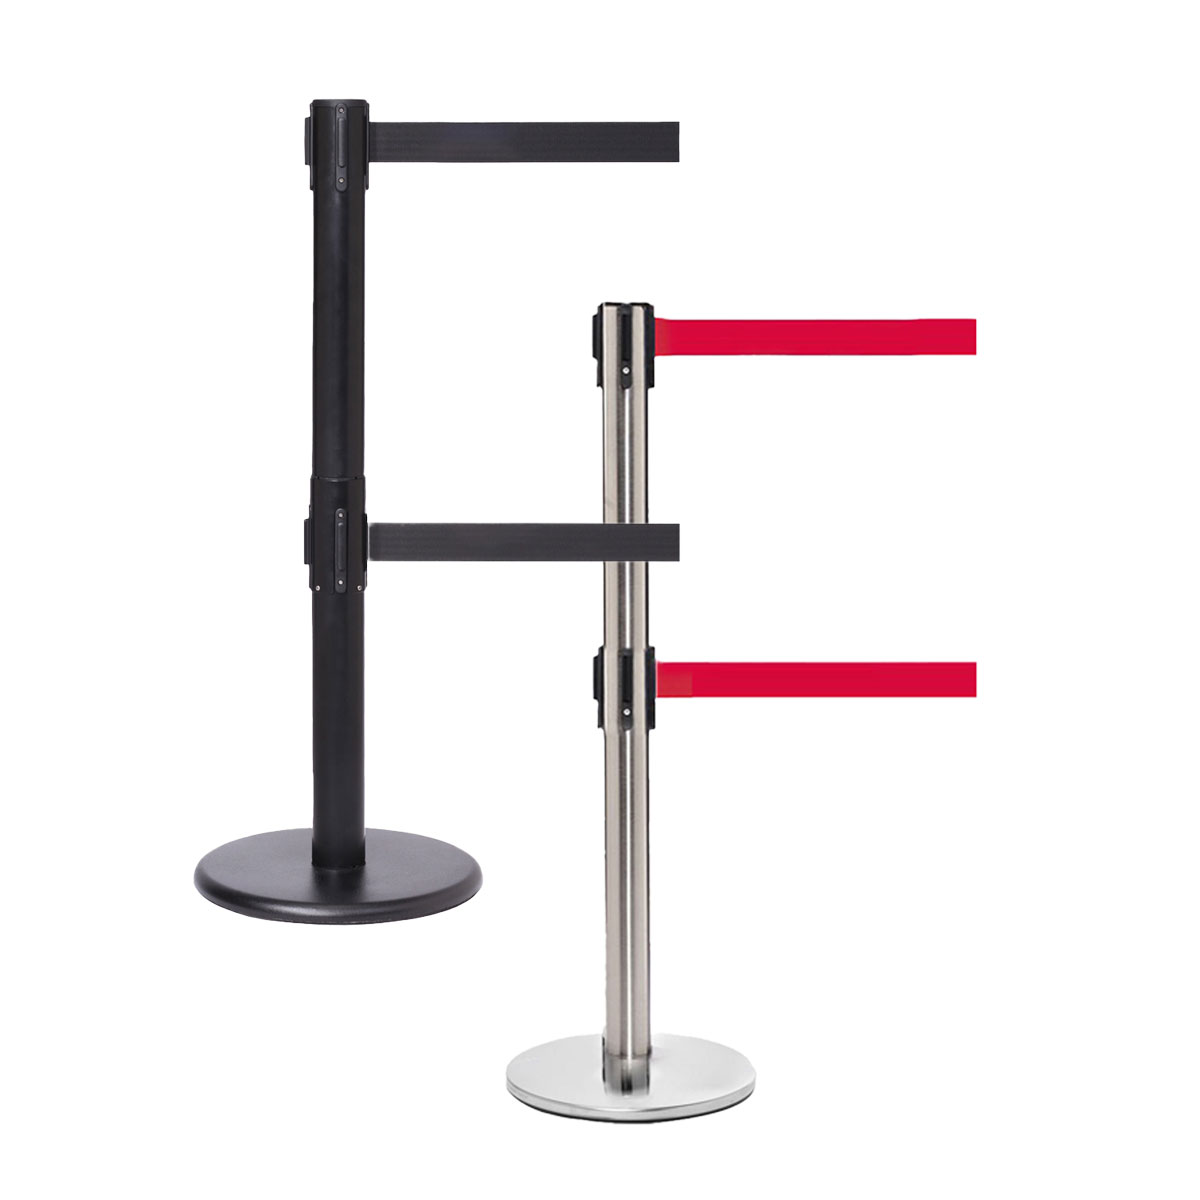 QueuePro Dual Retractable Queue Barriers